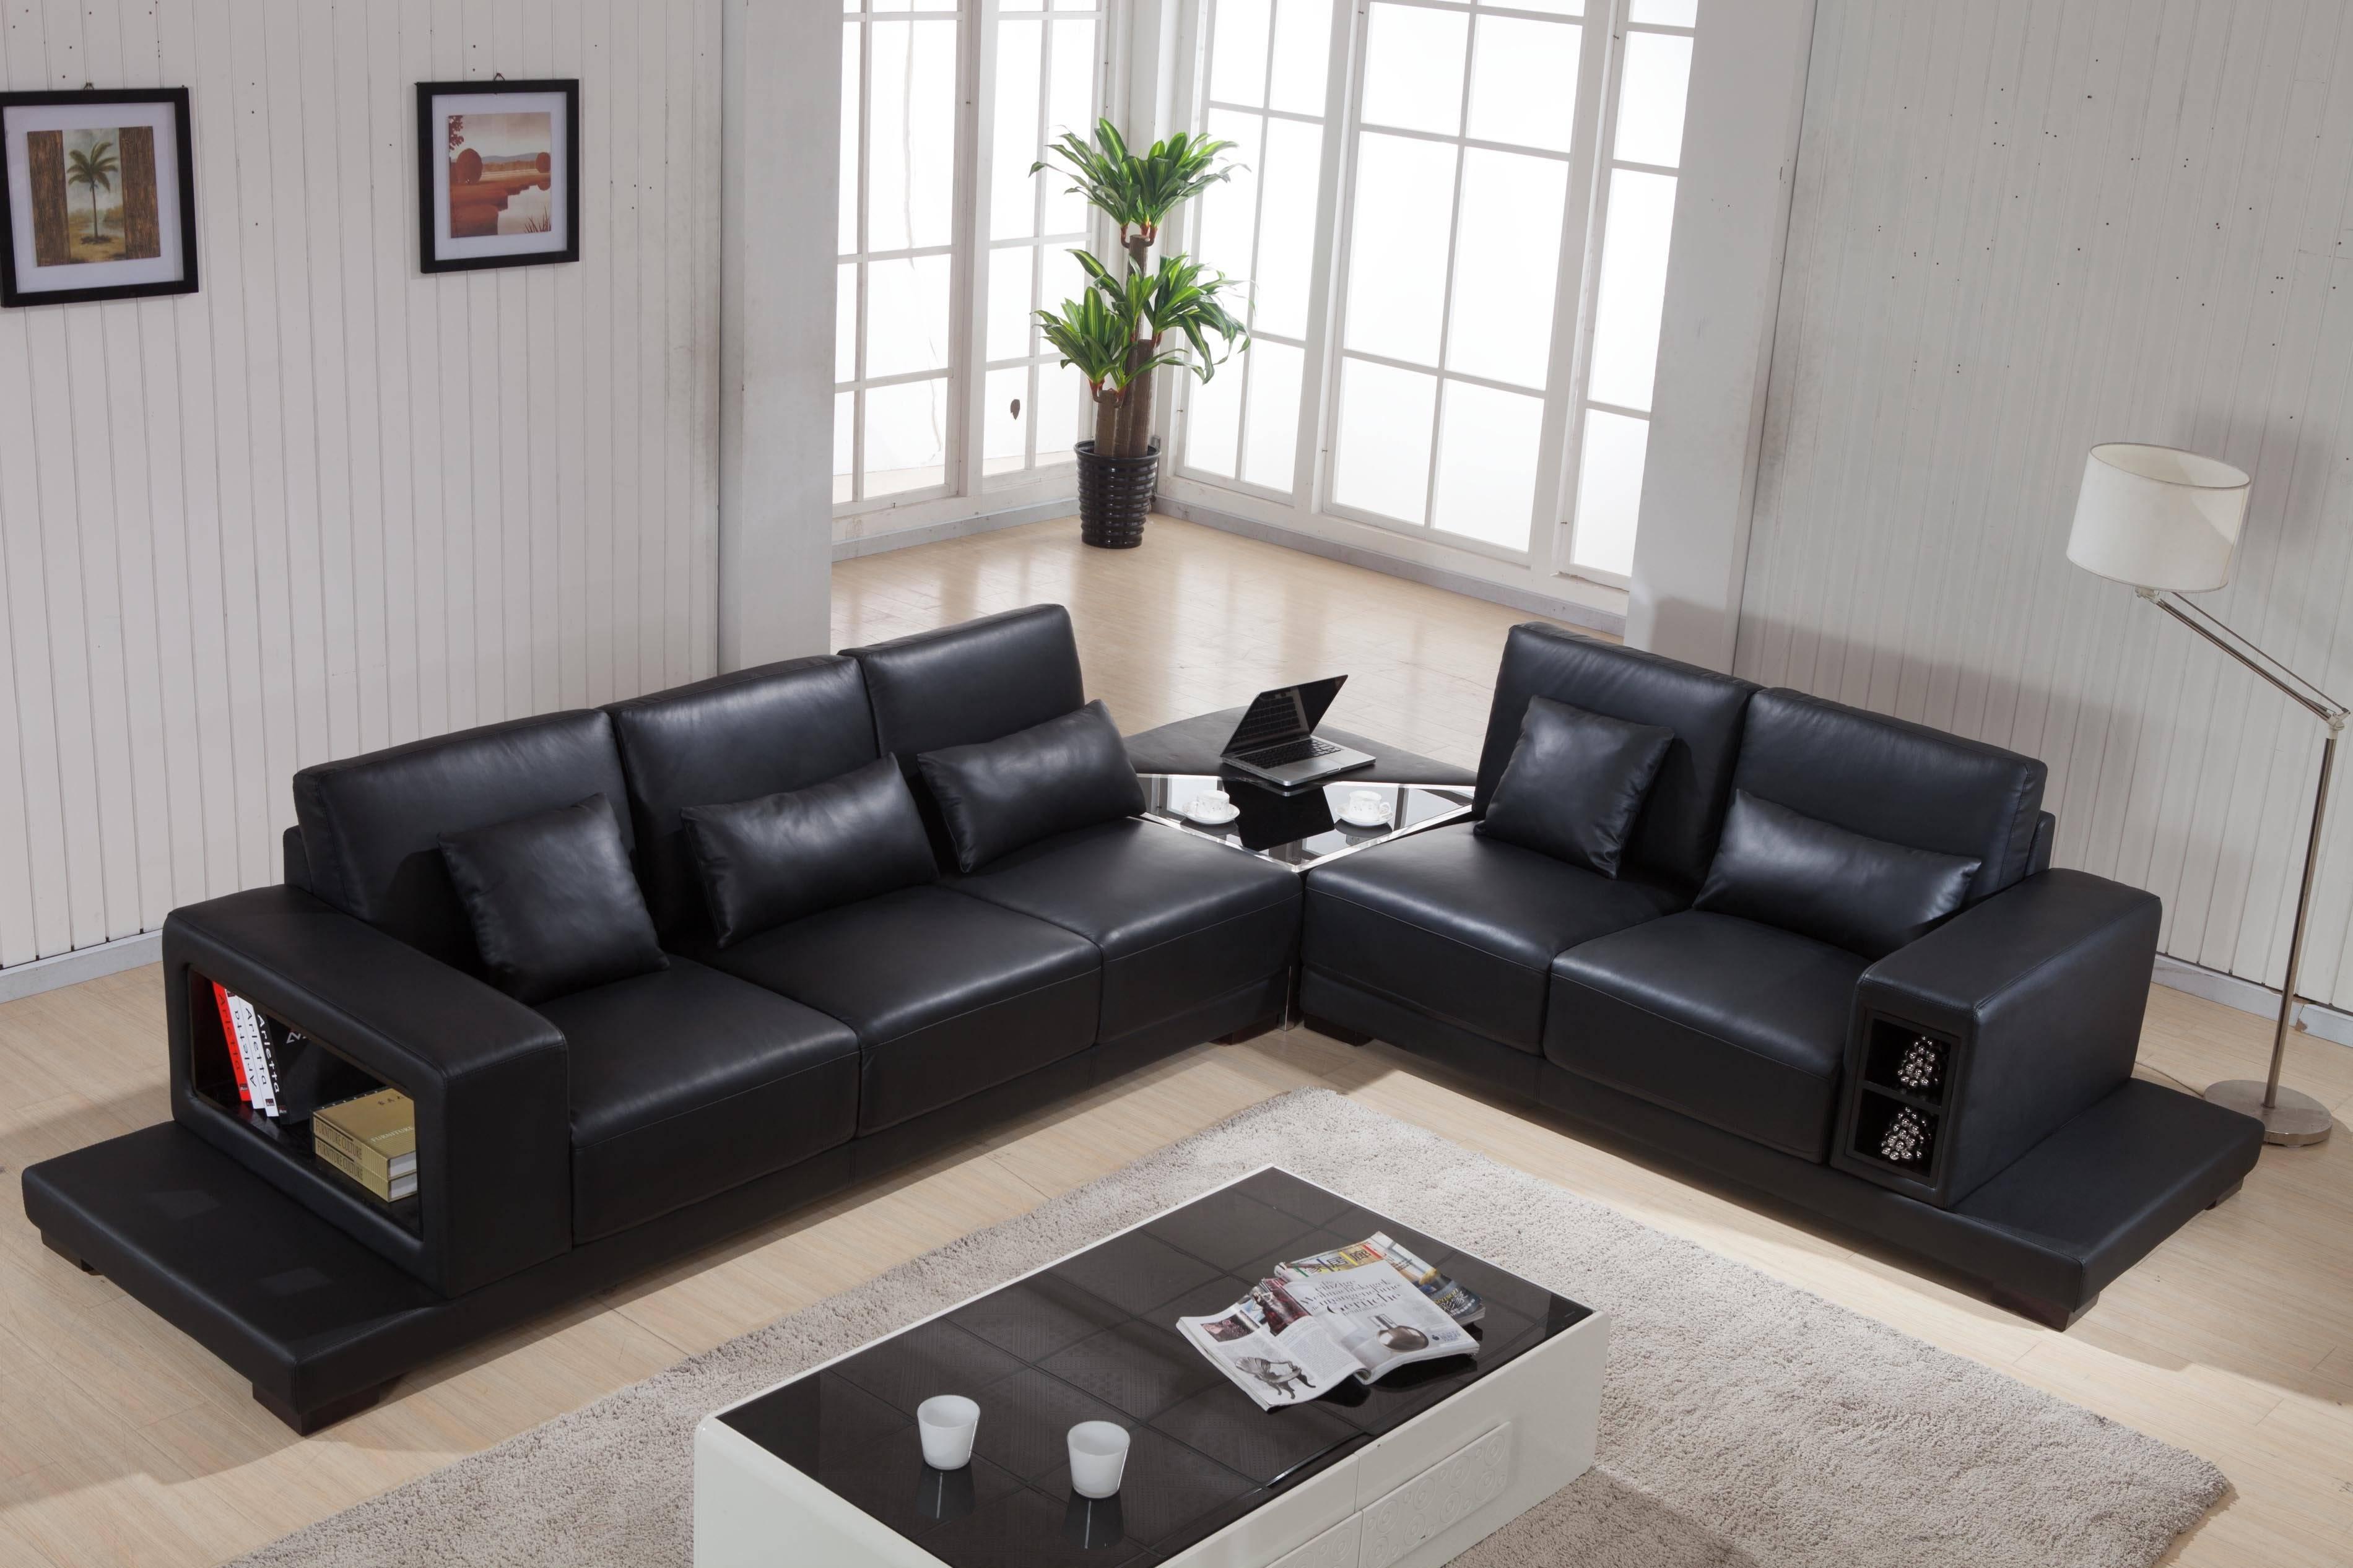 Leather Corner Sofas Elegant Home Design throughout Sofa Corner Units (Image 12 of 30)